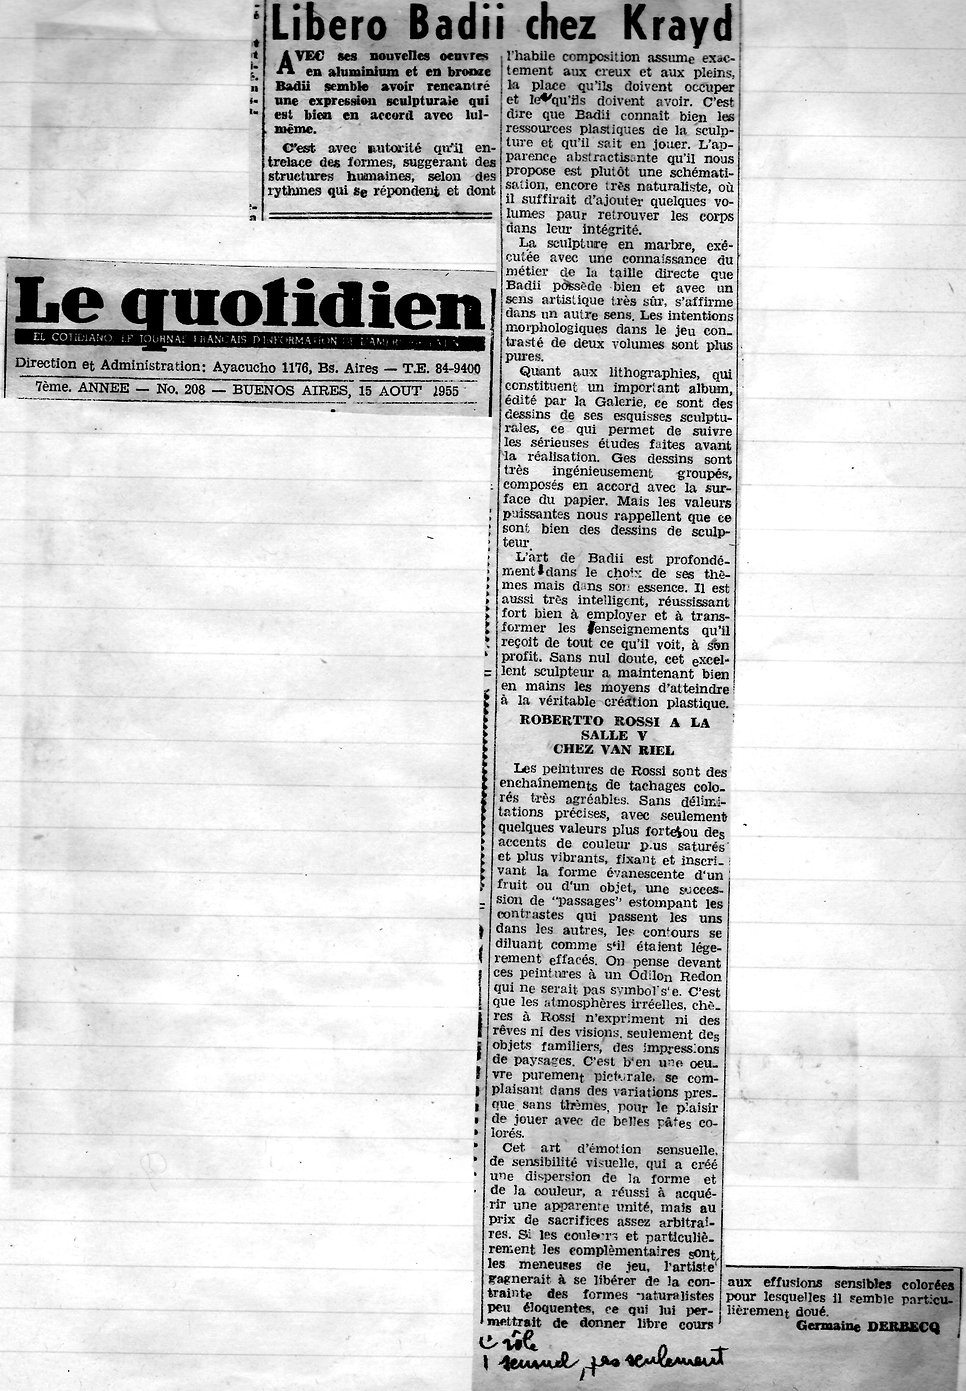 Le_Quotidien2_-_Libero_Badií_chez_Krayd.